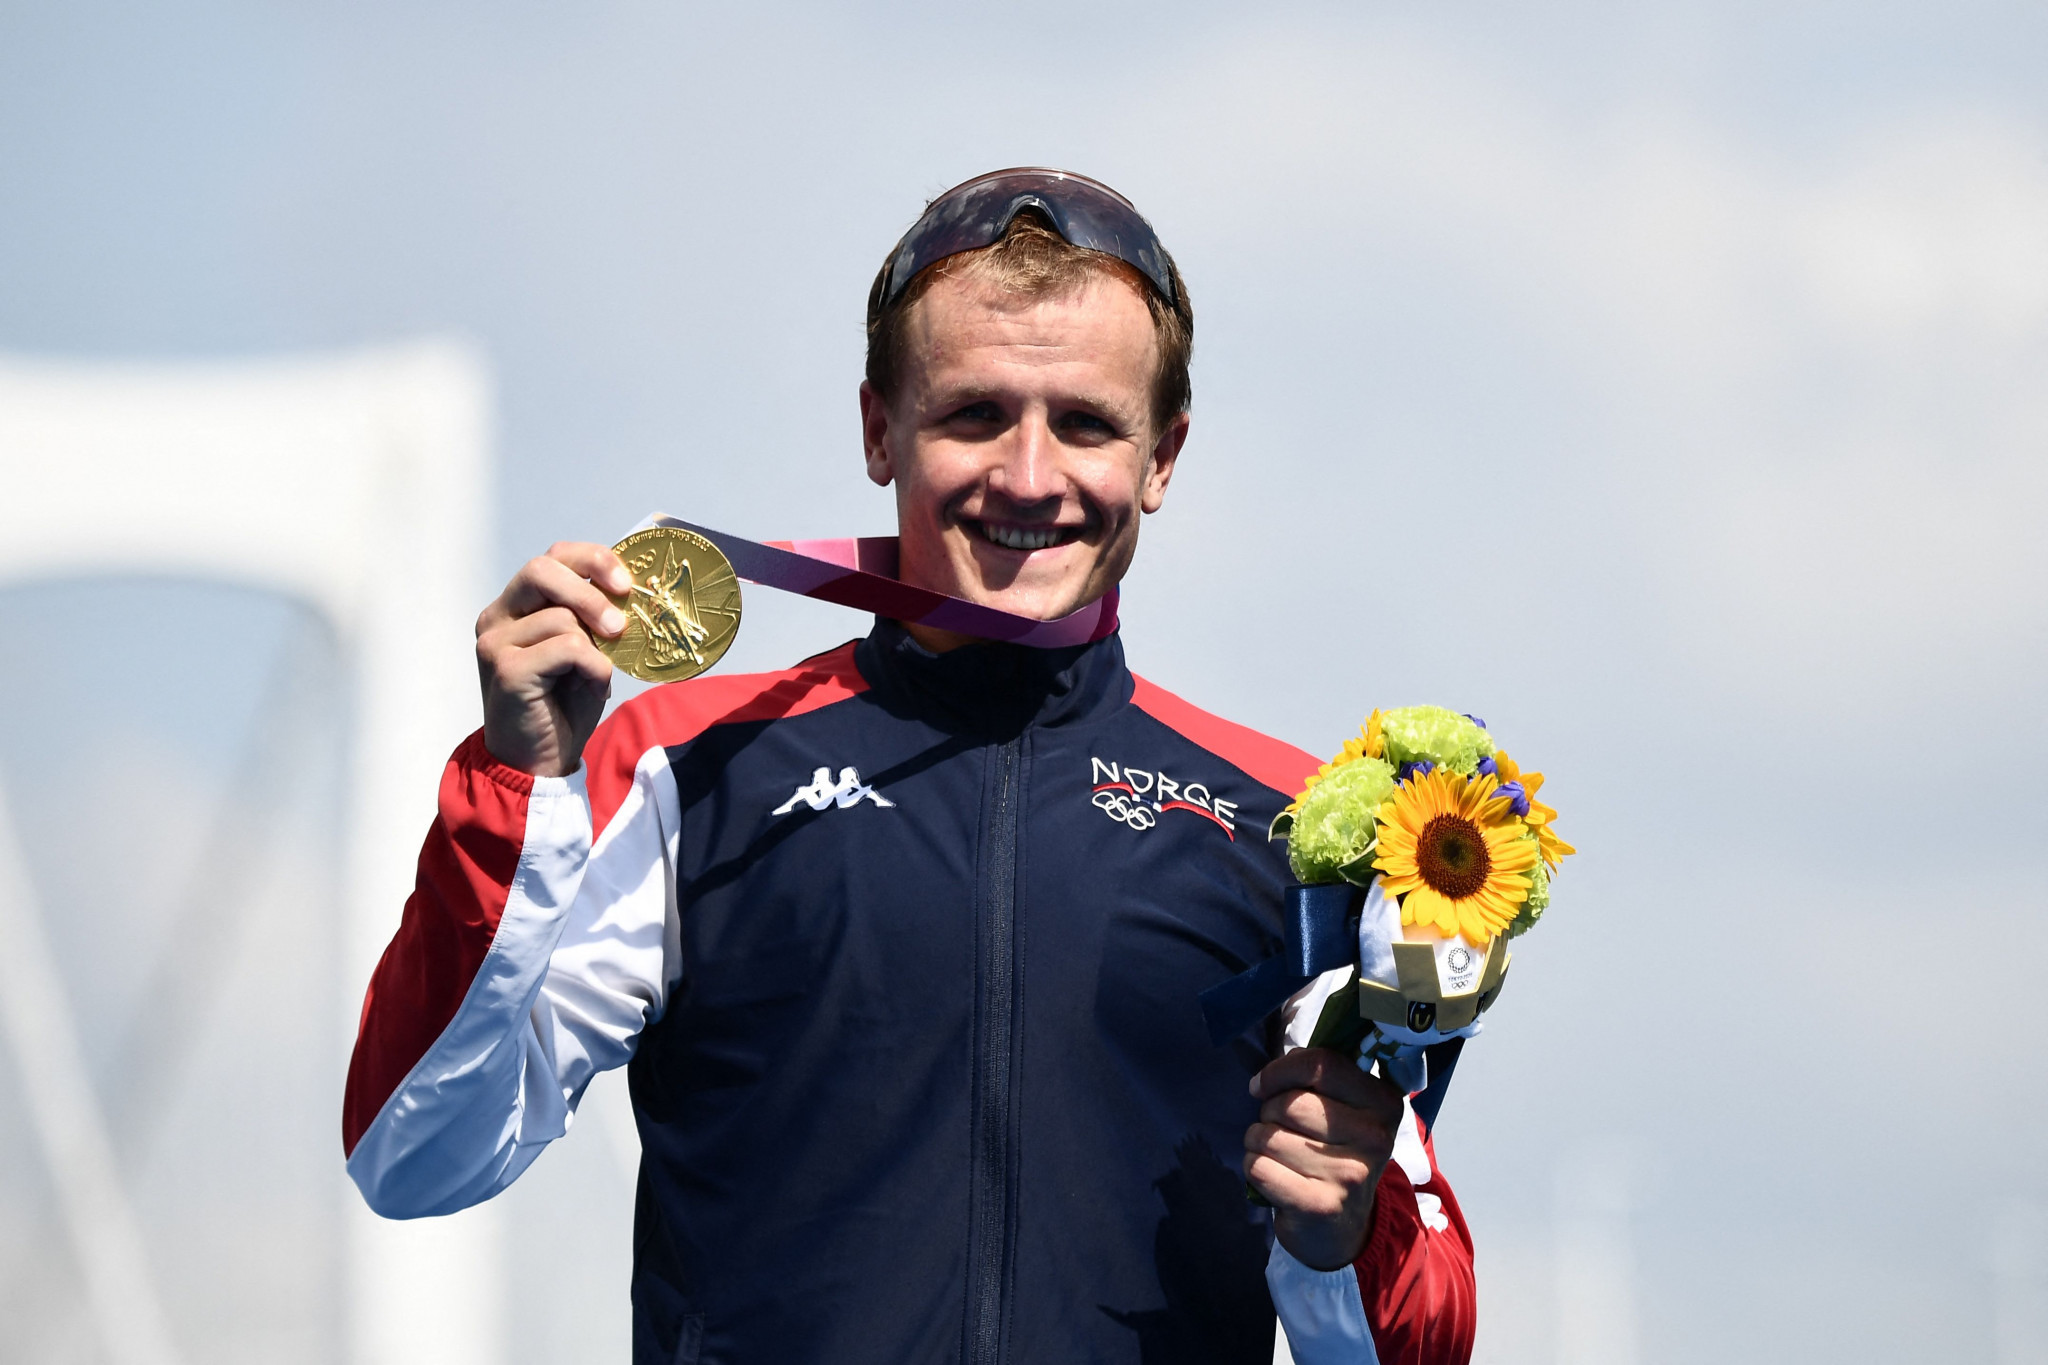 Triathlon Olympic gold medallist Kristian Blummenfelt pays tribute to Norway's heat operation